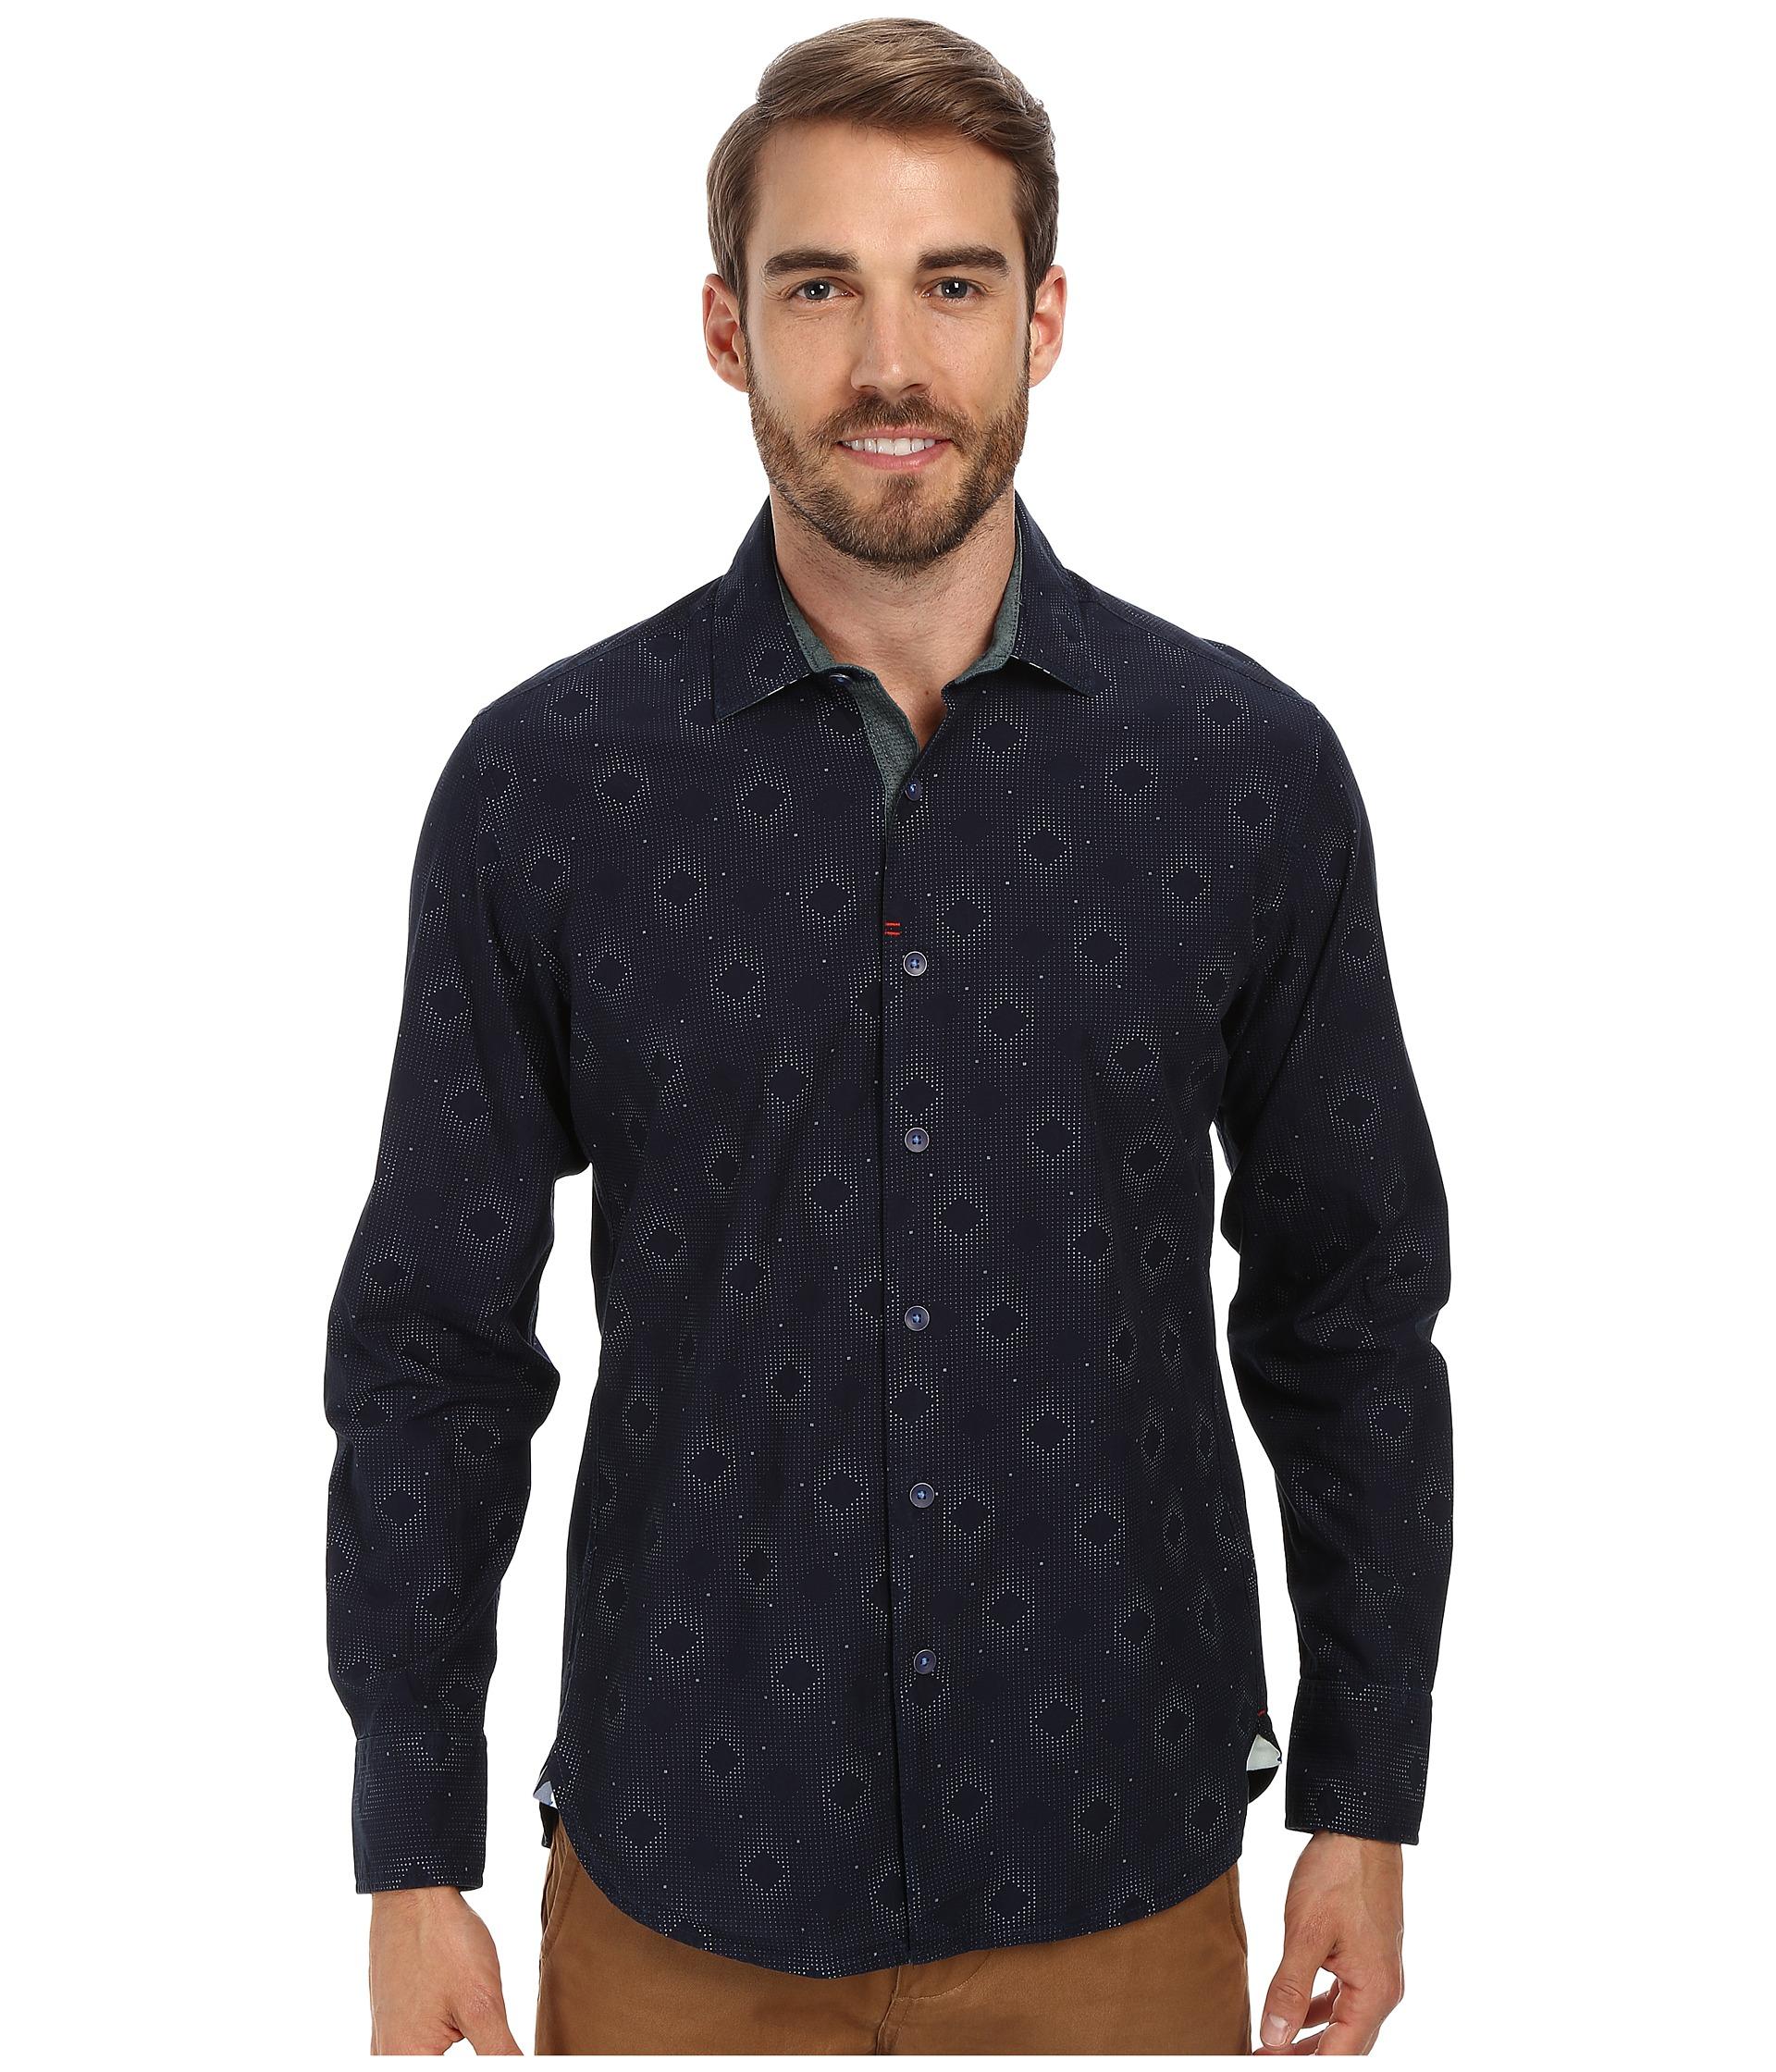 Robert Graham Los Cabos Long Sleeve Woven Shirt in Black ... Robert Graham Designer